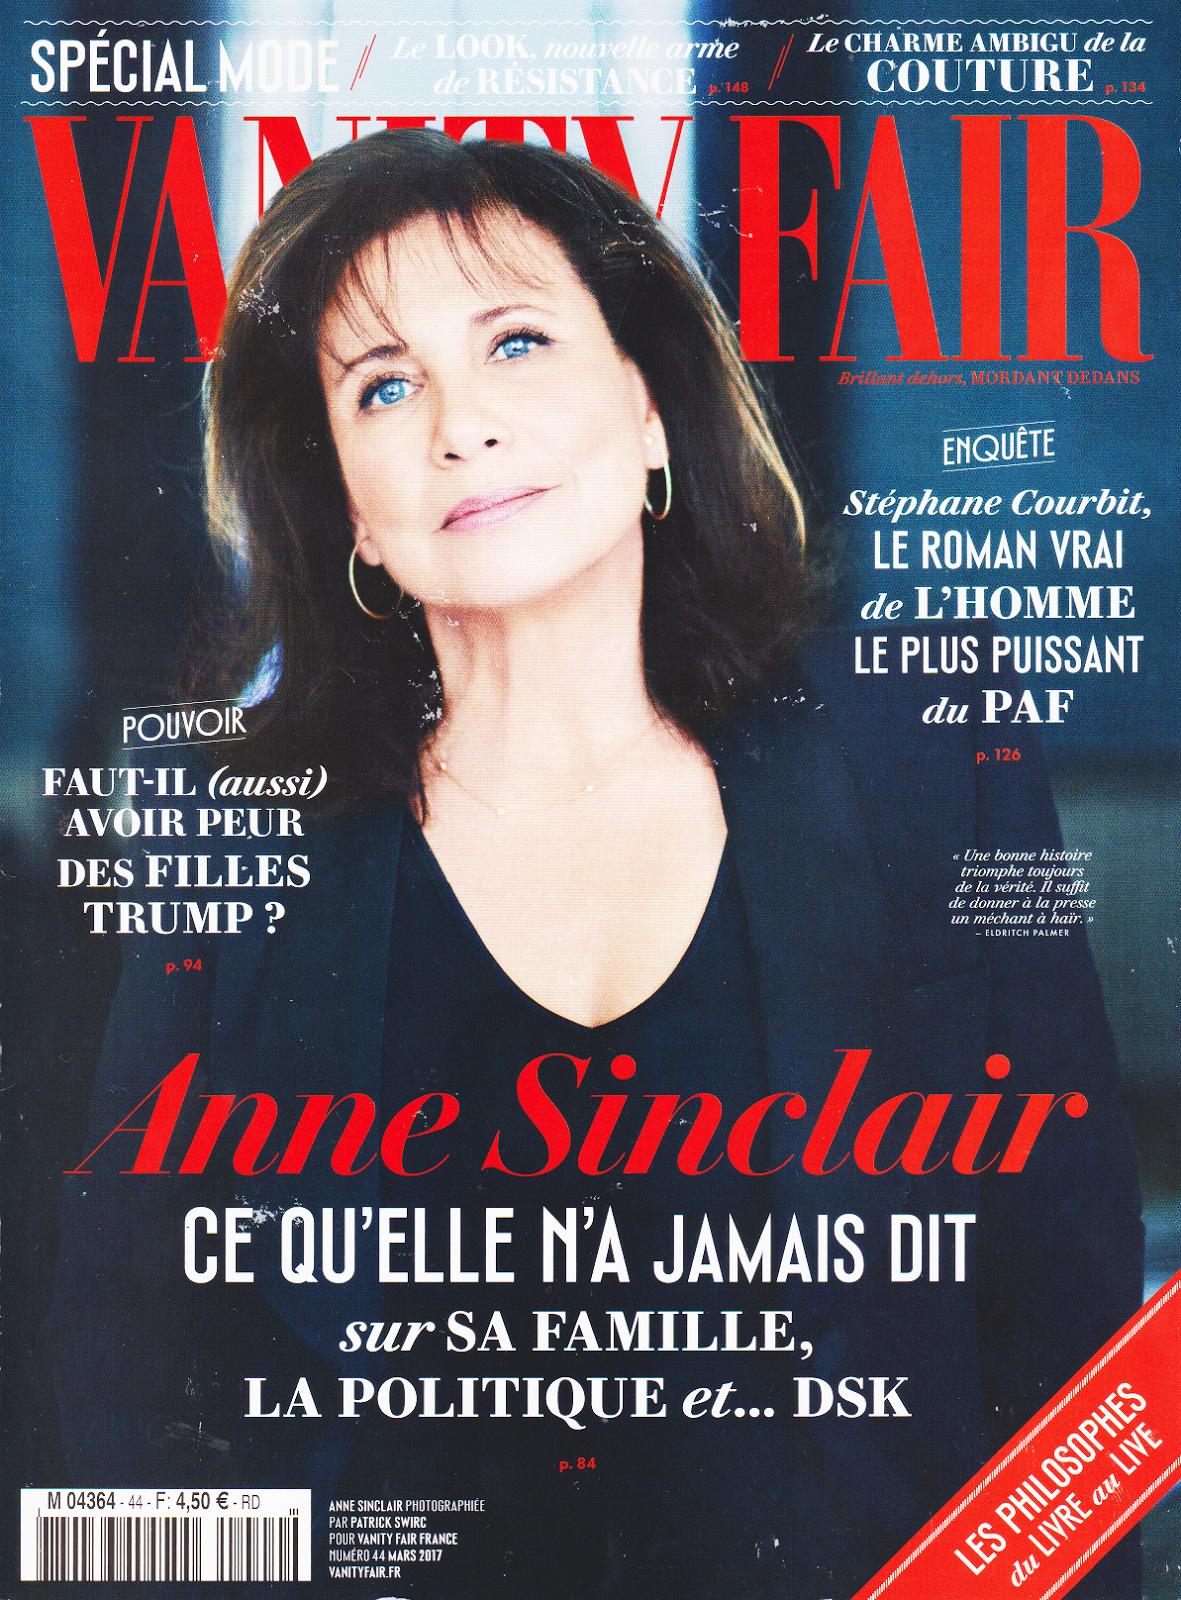 vanity fair is back la ptite bulle d elo